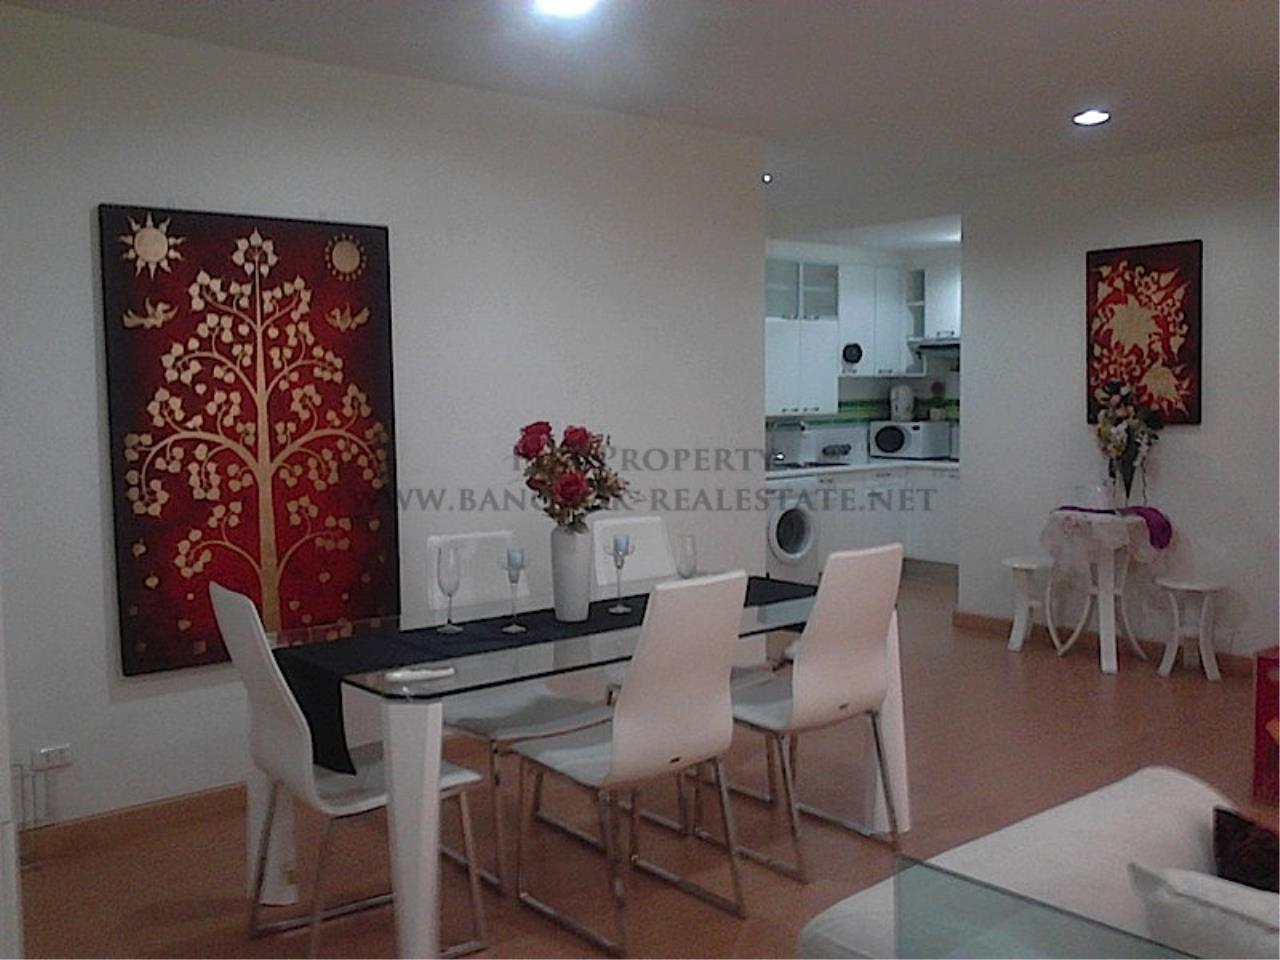 Piri Property Agency's The Address 42 - Spacious 2 Bedroom Unit 5